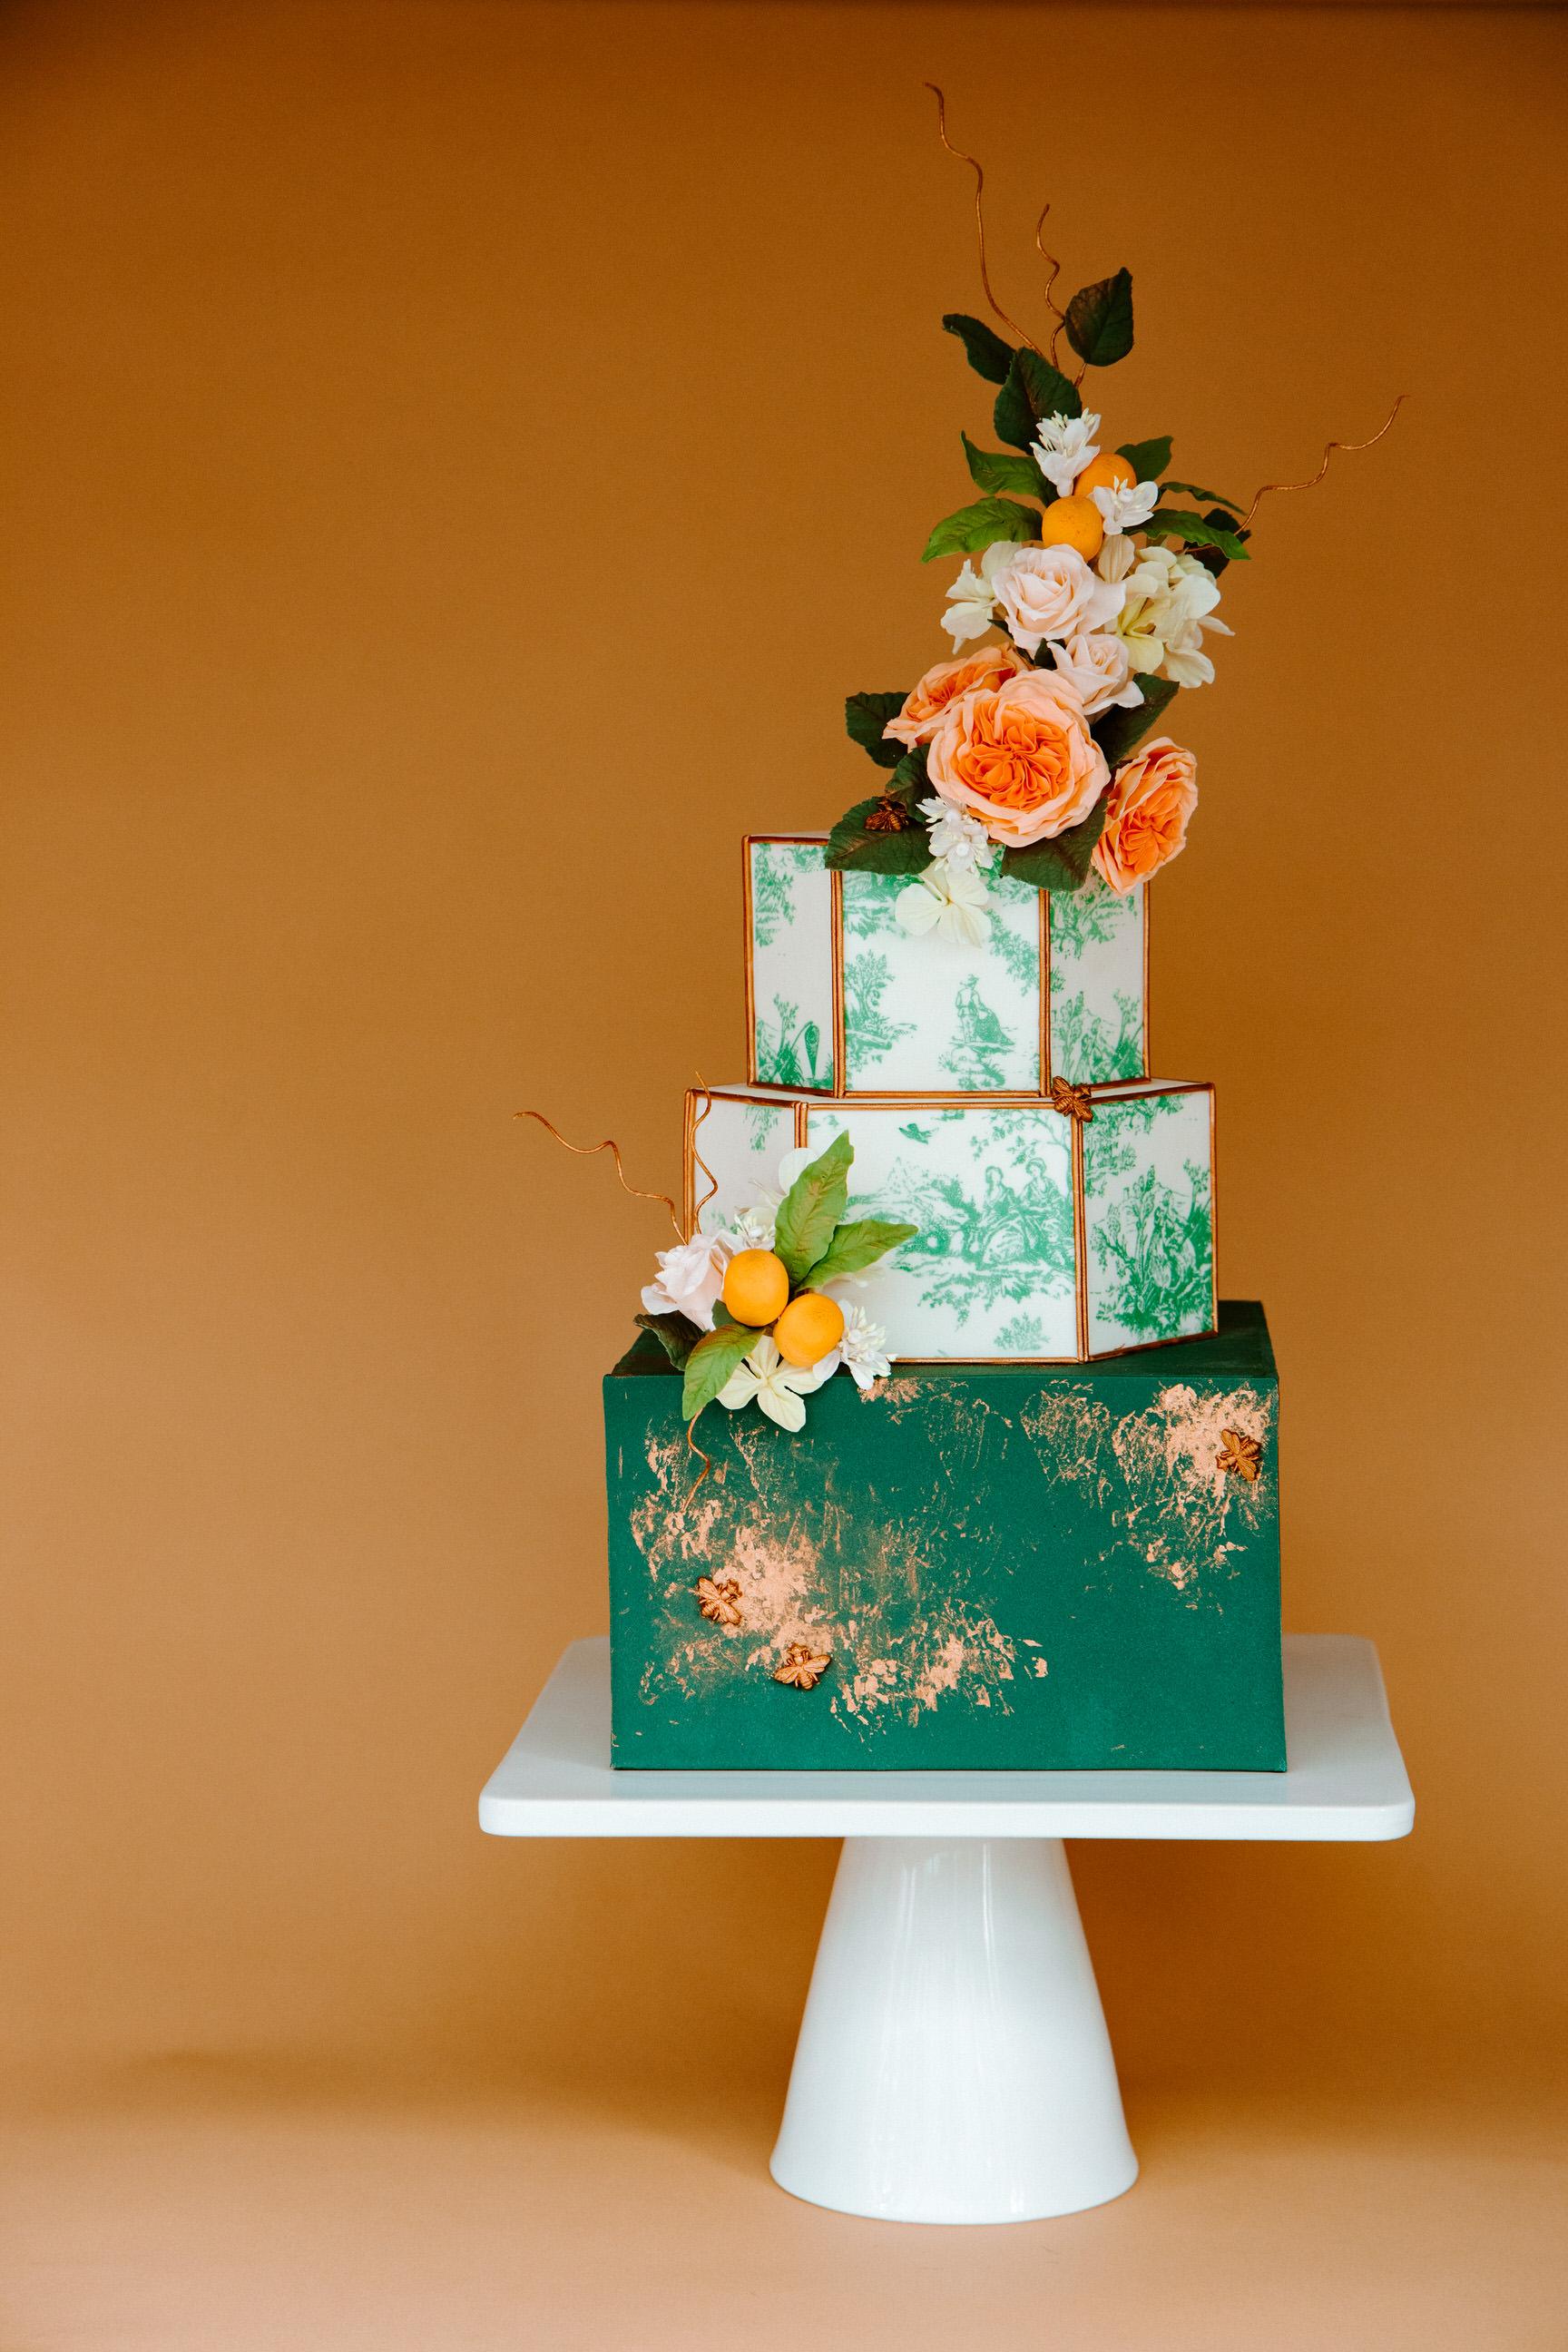 gateaux-cake-7421.jpg